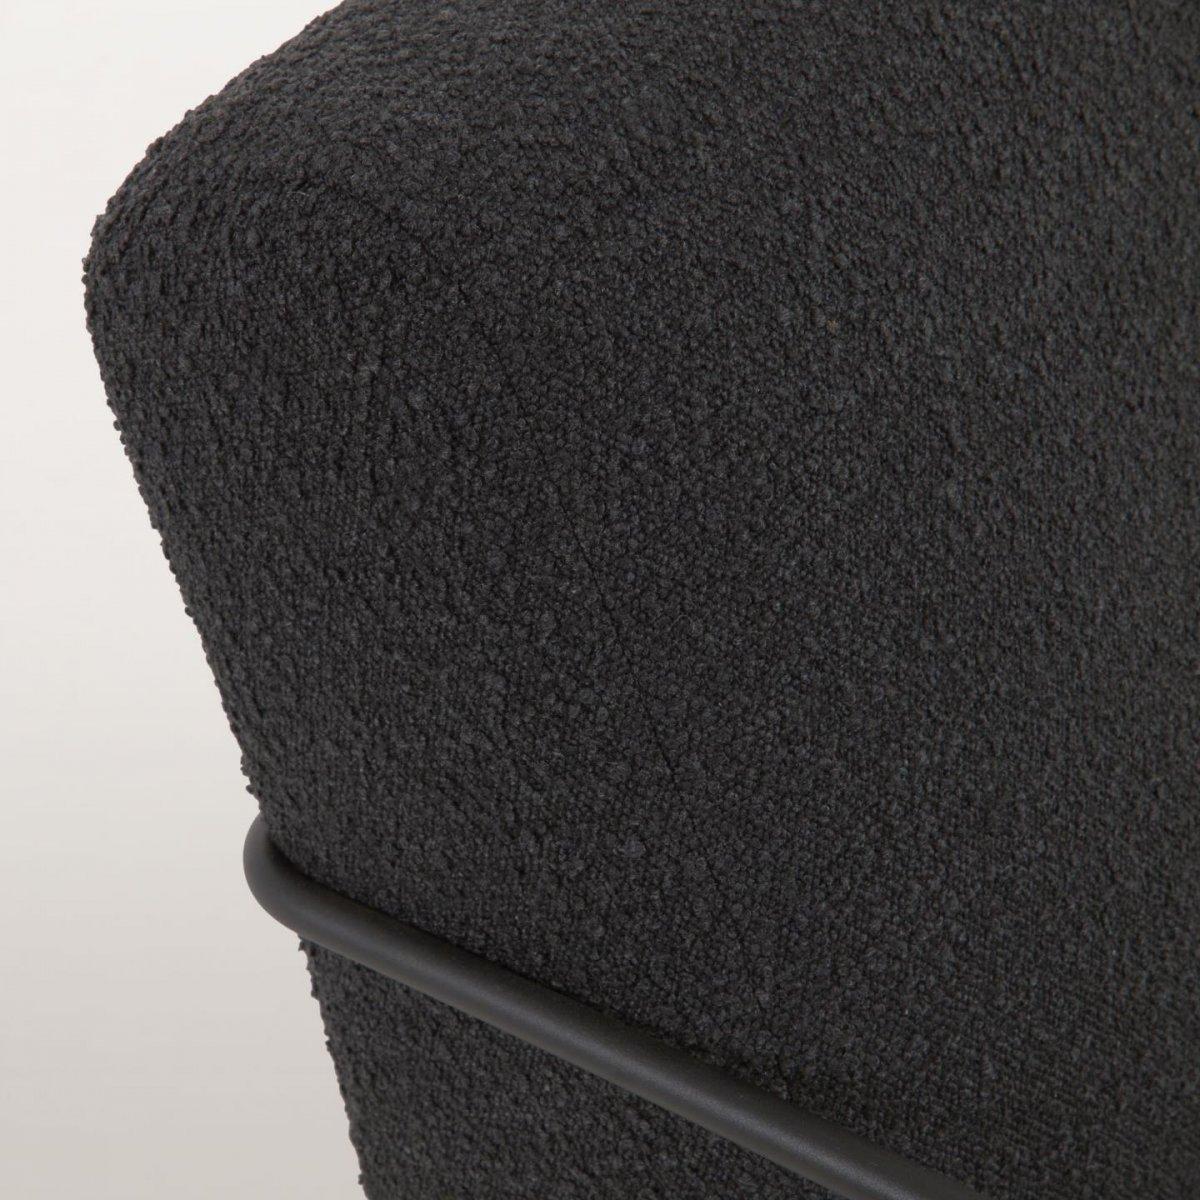 Keihome Linea J Poltrona Gamer in tessuto shearling nero